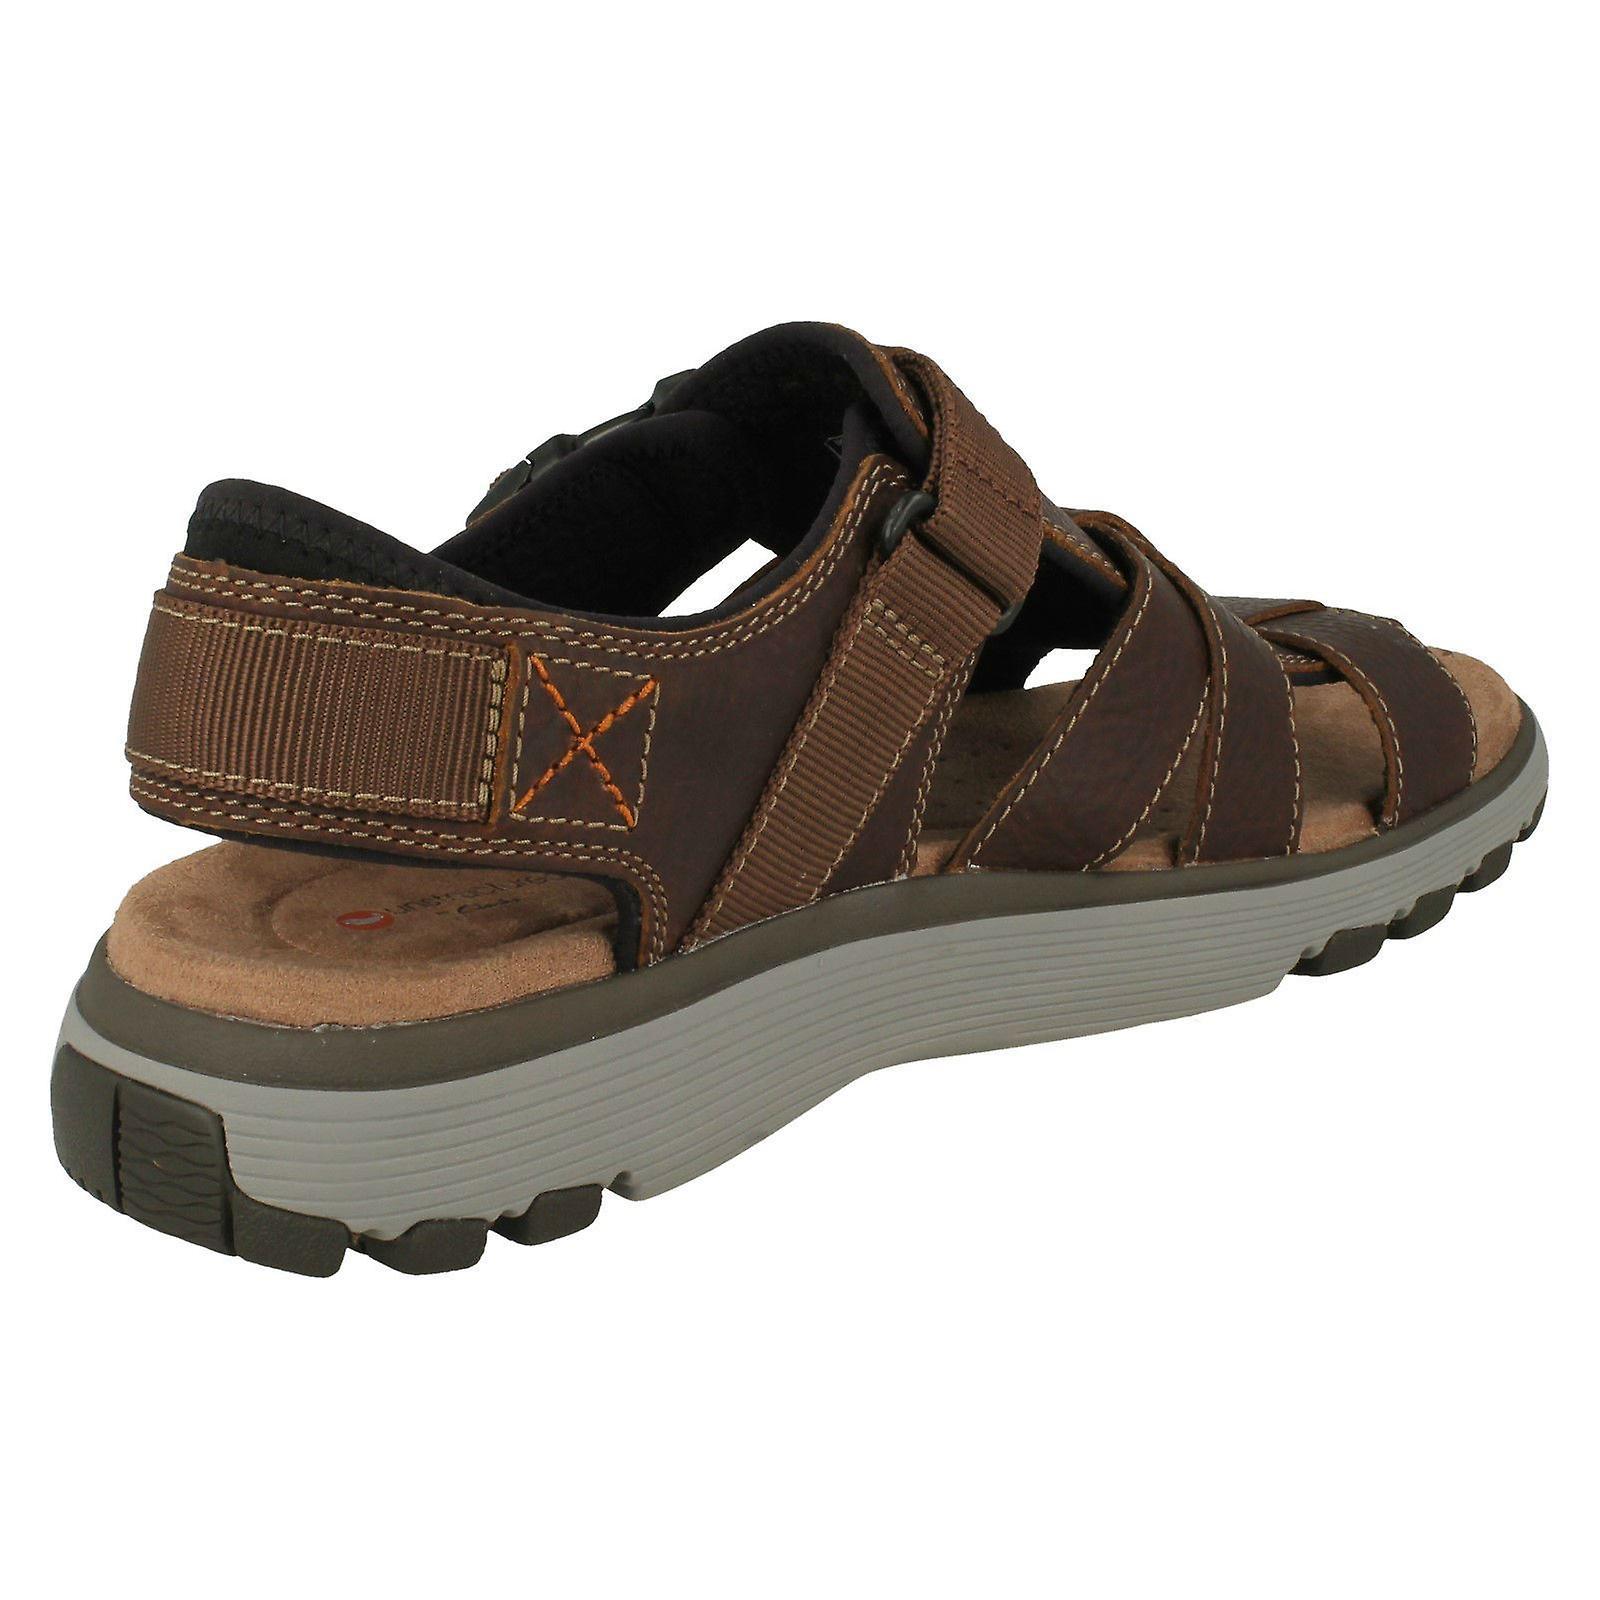 b7d44f6d28f4 Mens Clarks Casual Strapped Sandals Un Trek Cove - Dark Tan Leather - UK  Size 7.5